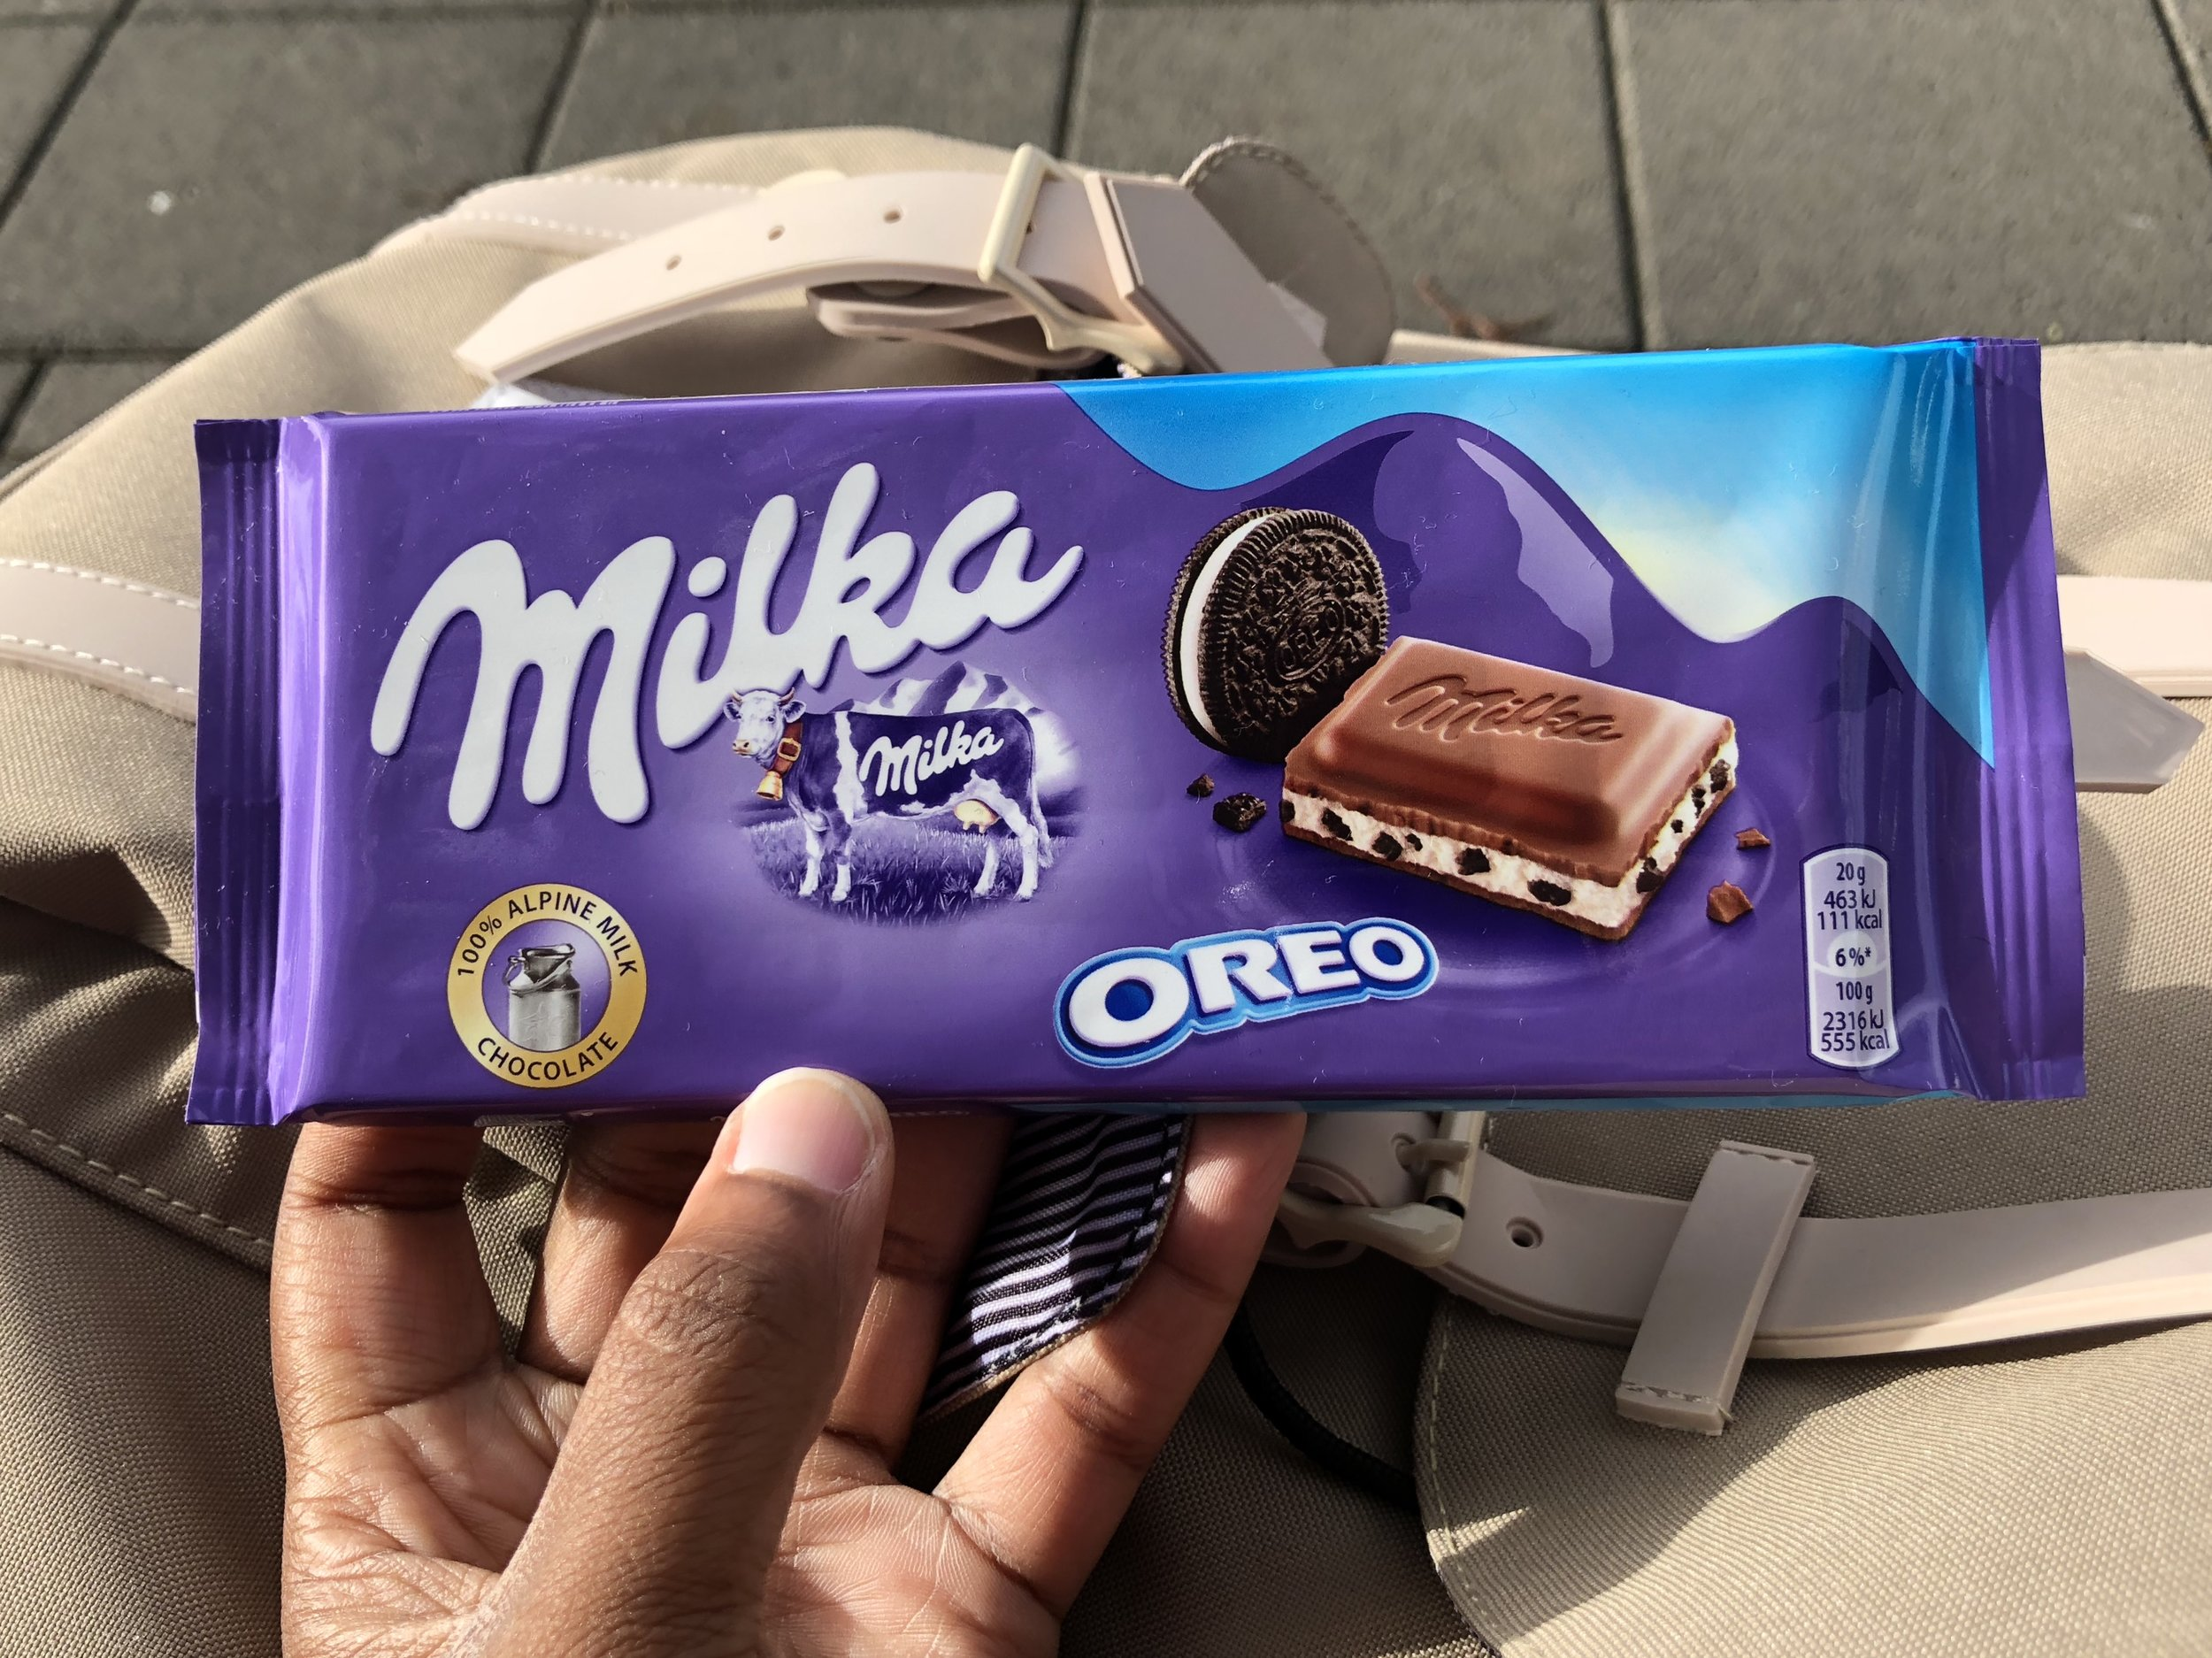 European chocolate